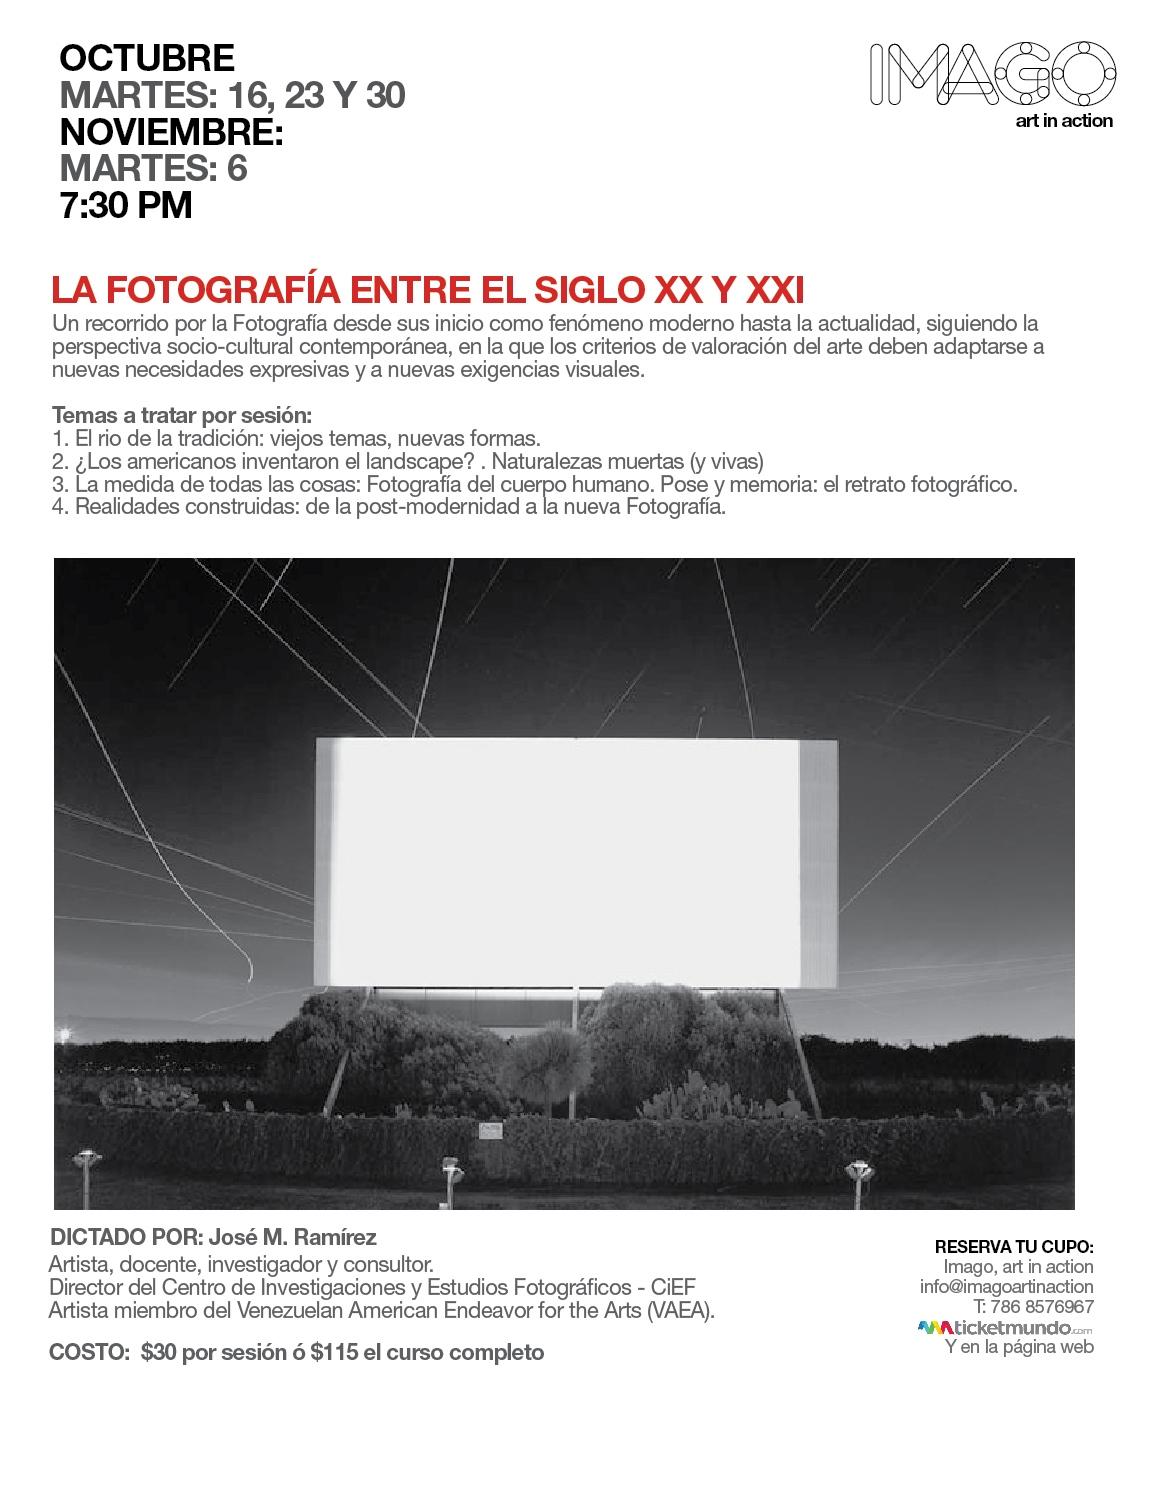 Art and Documentary Photography - Loading fotografia_entre_el_s.xx_y_xxi_.jpg